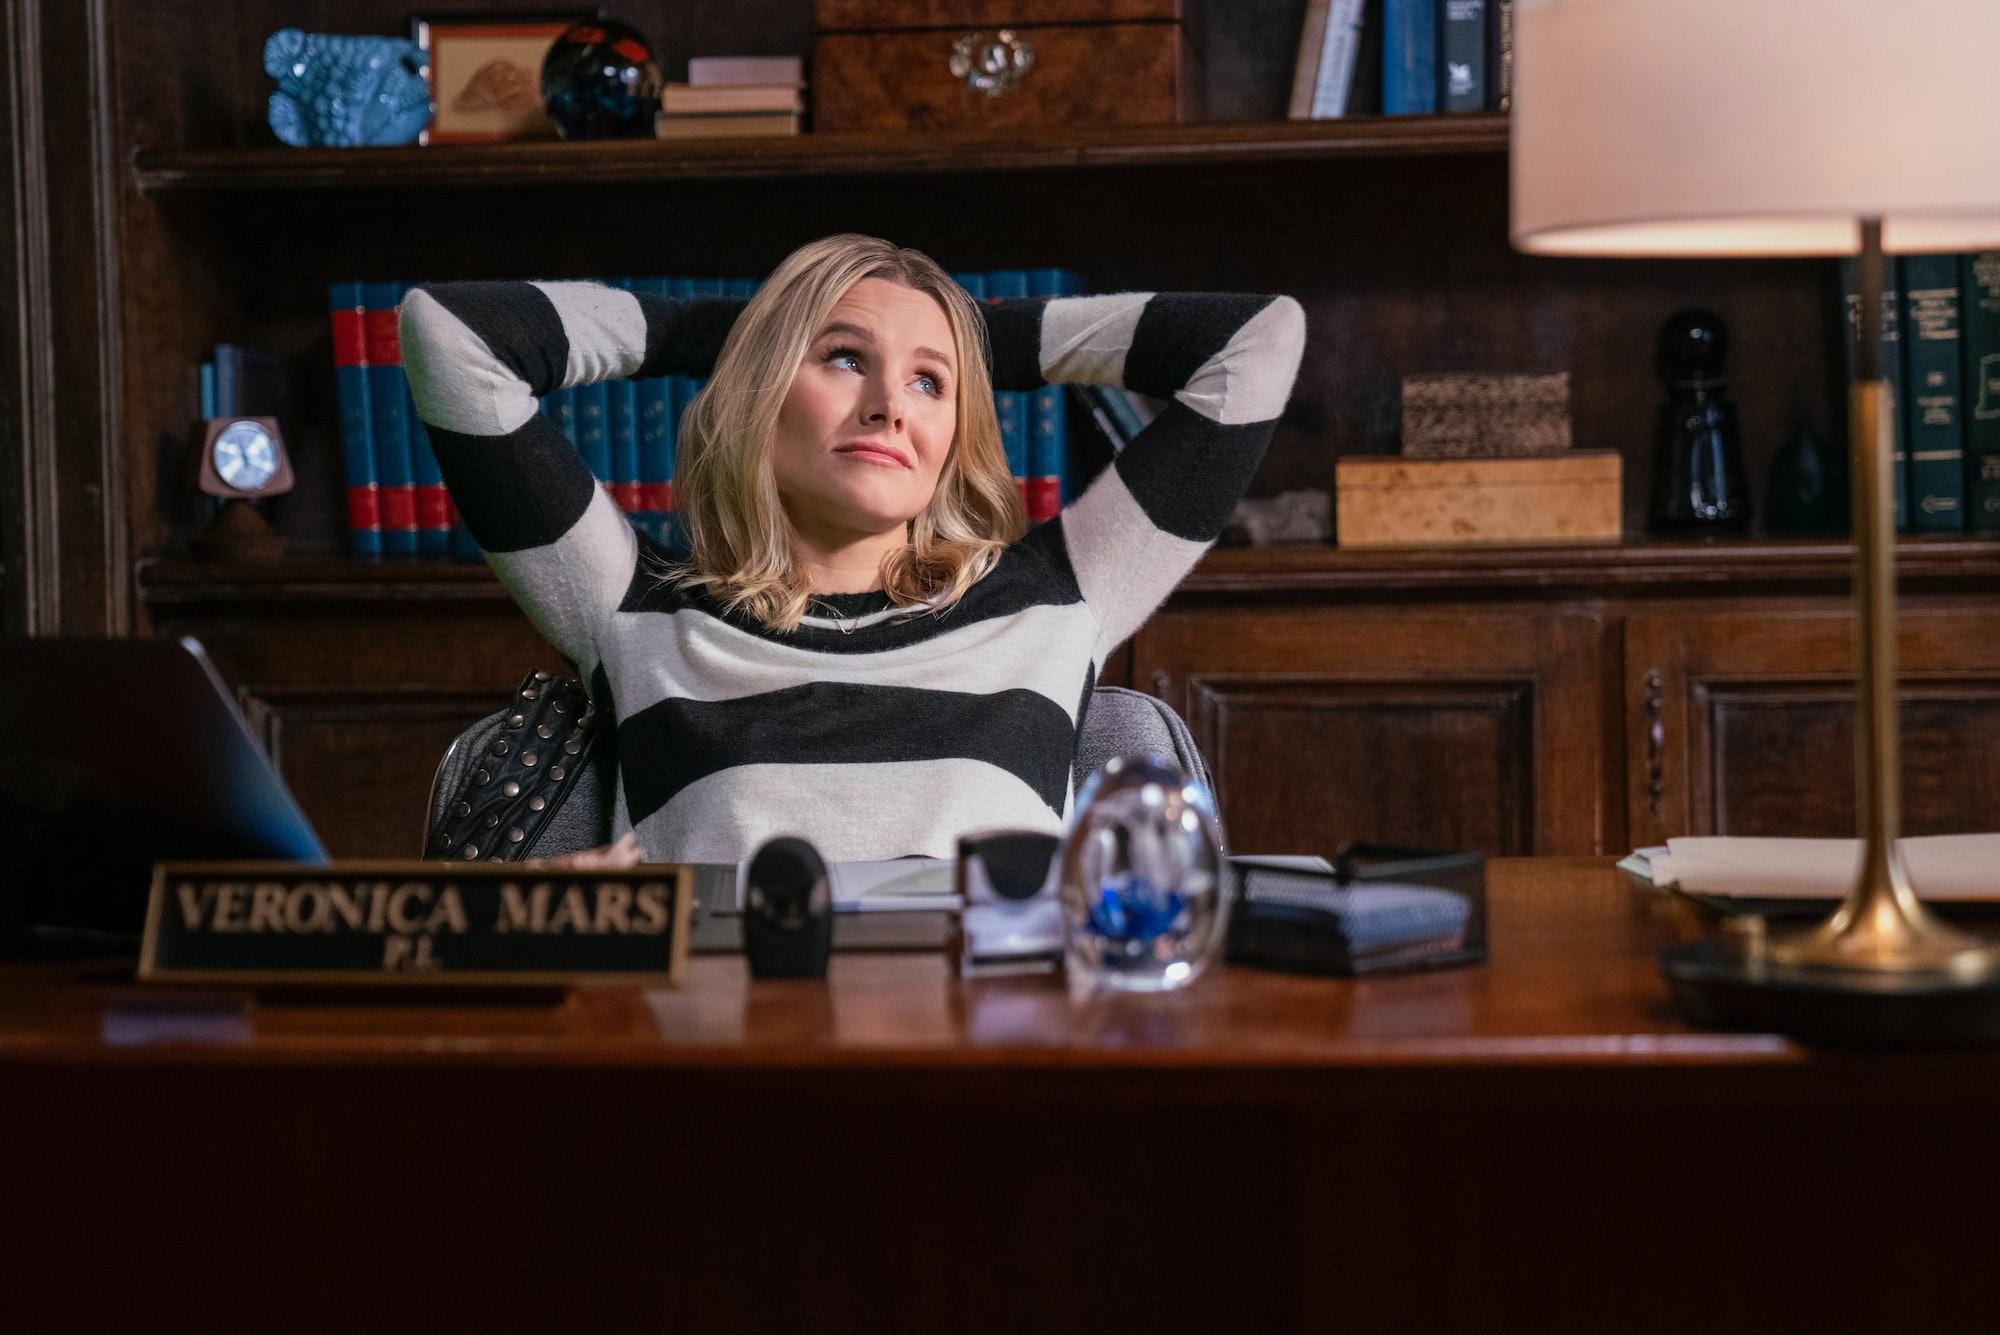 Veronica Mars Season 4 Hulu